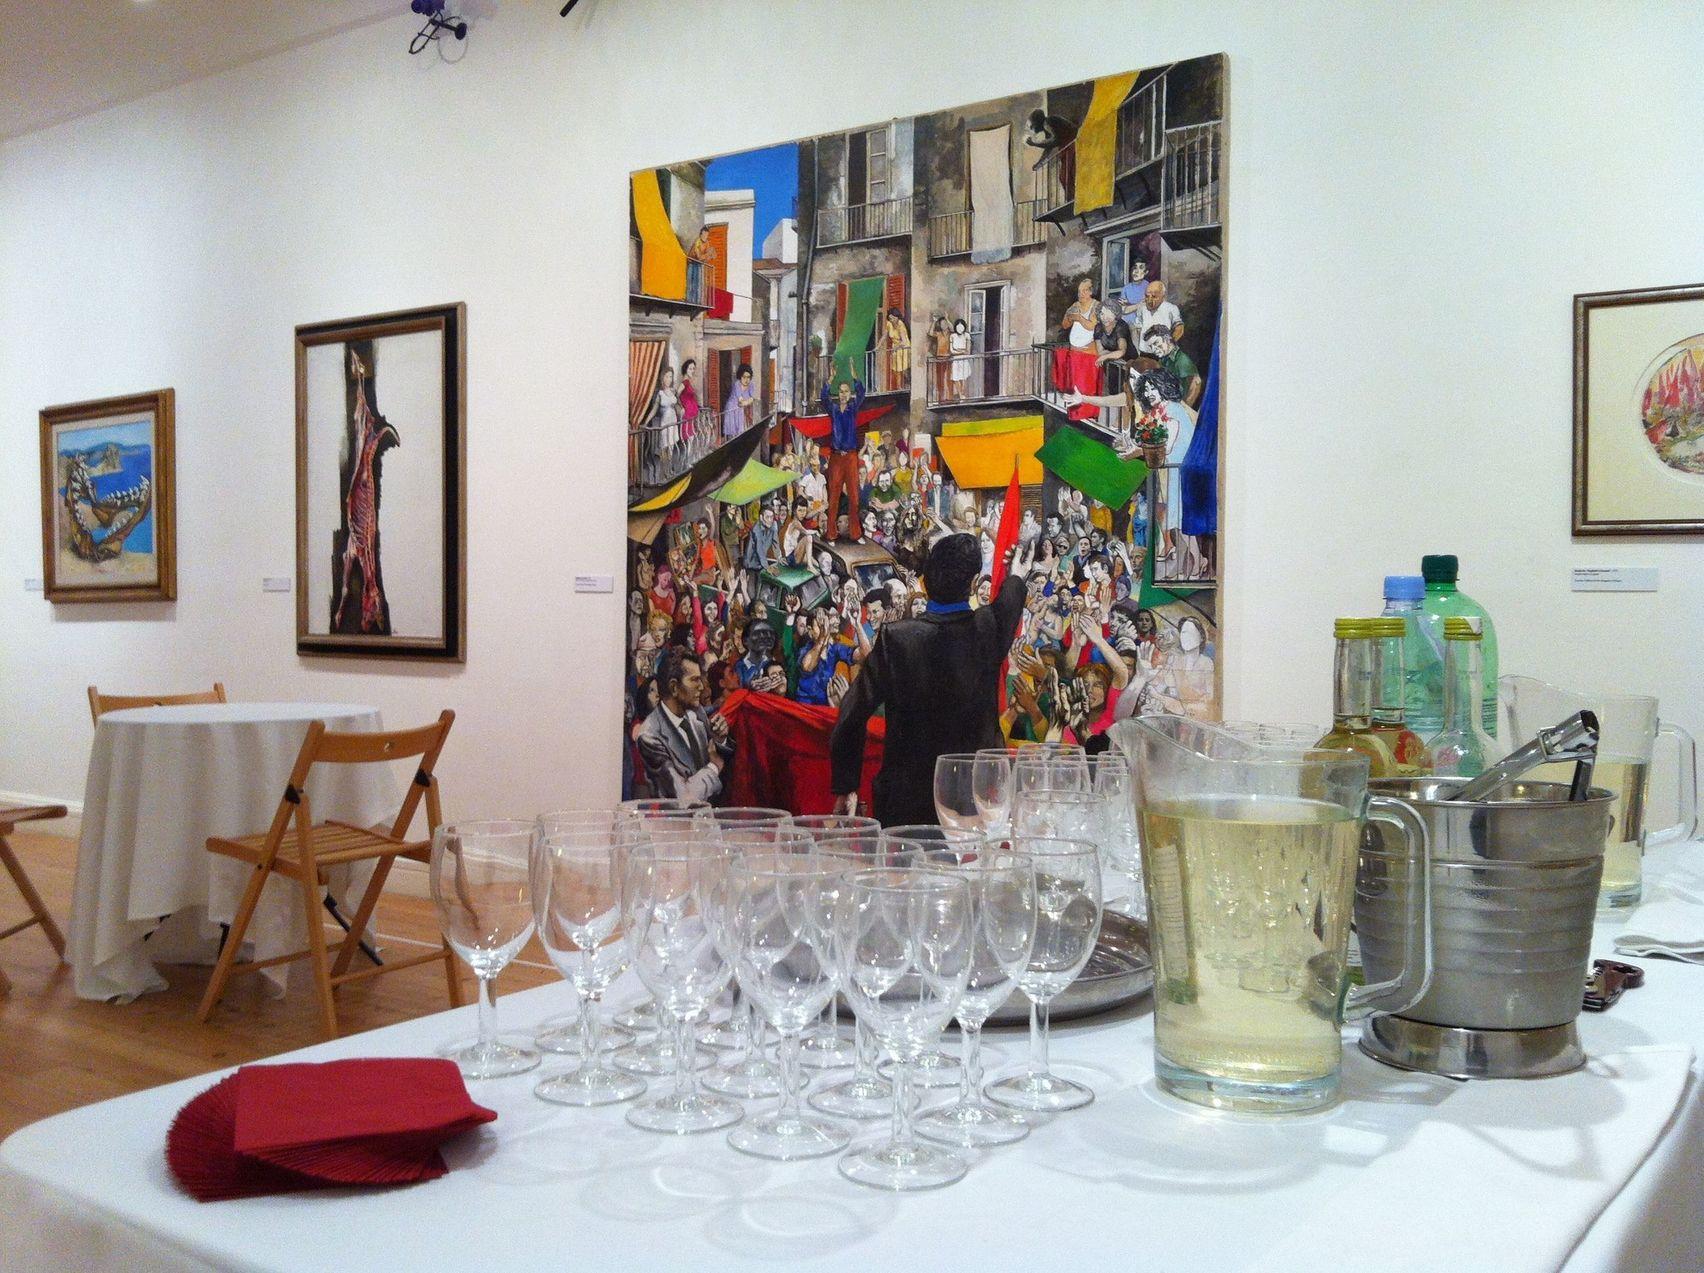 Galleries 1 & 2, Estorick Collection